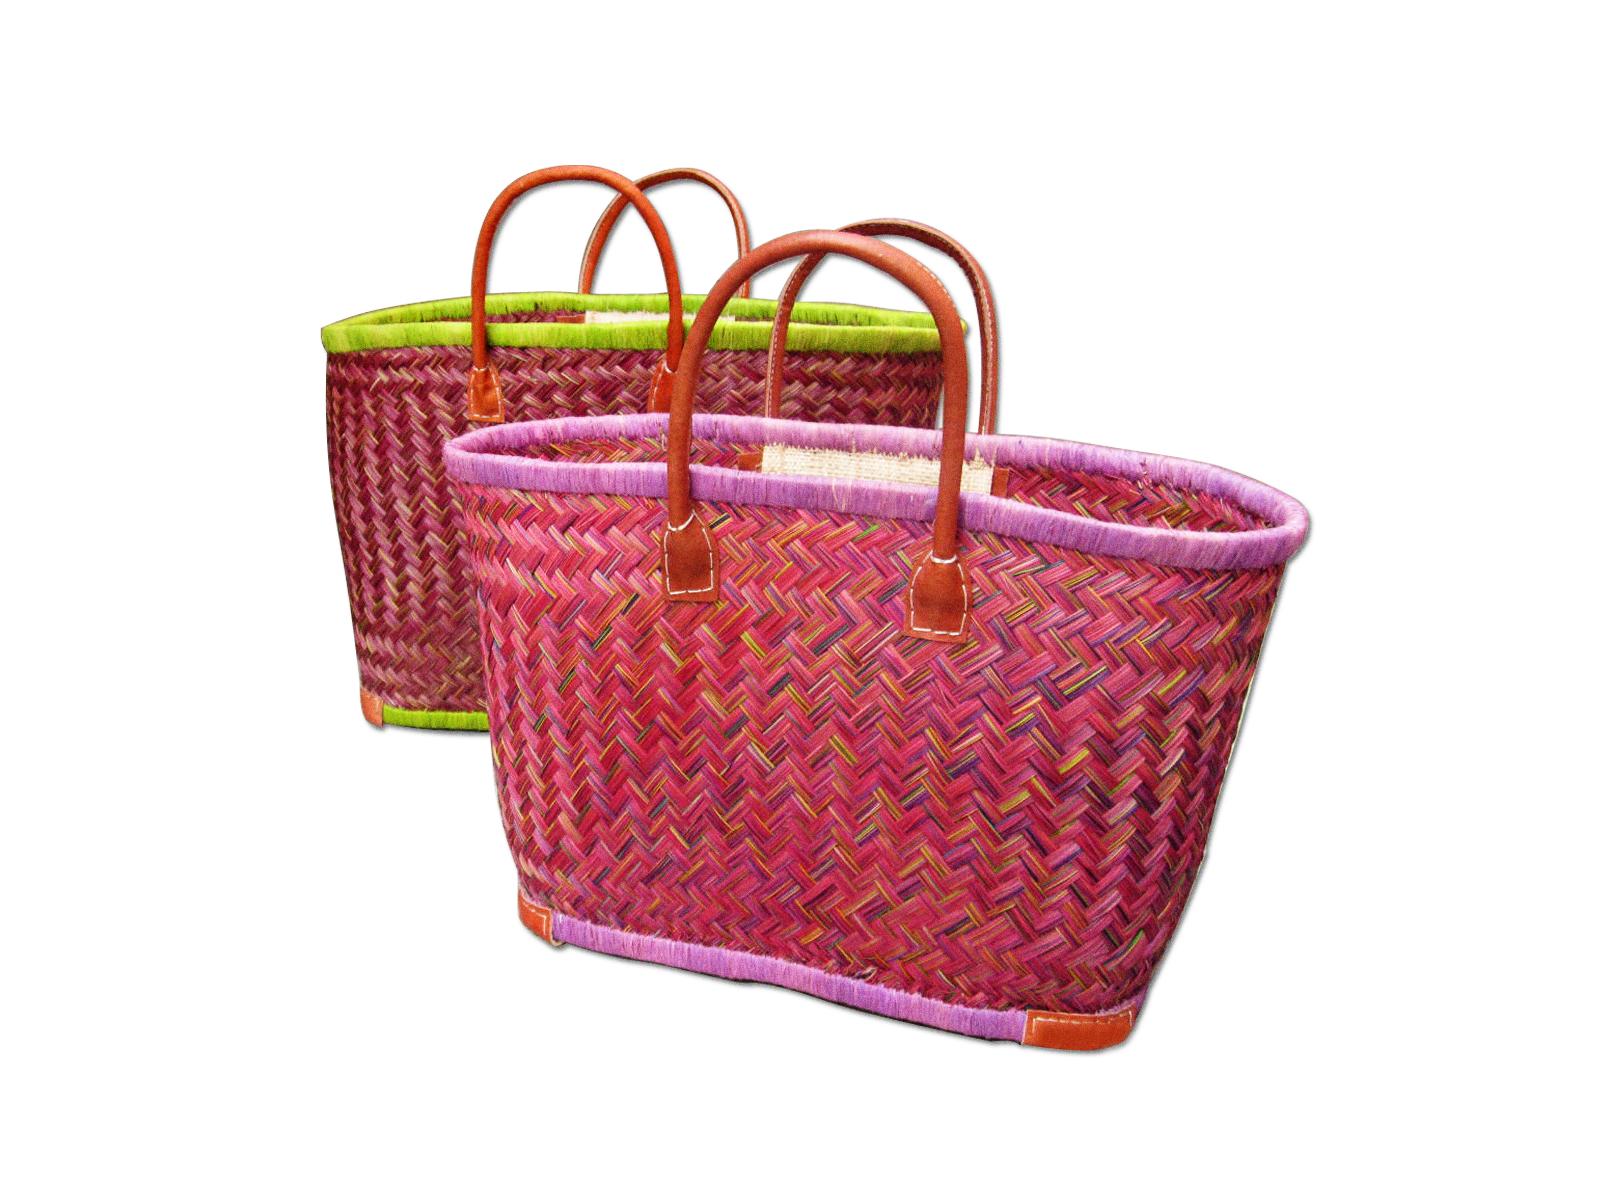 Malagasy Craft & Artisanat